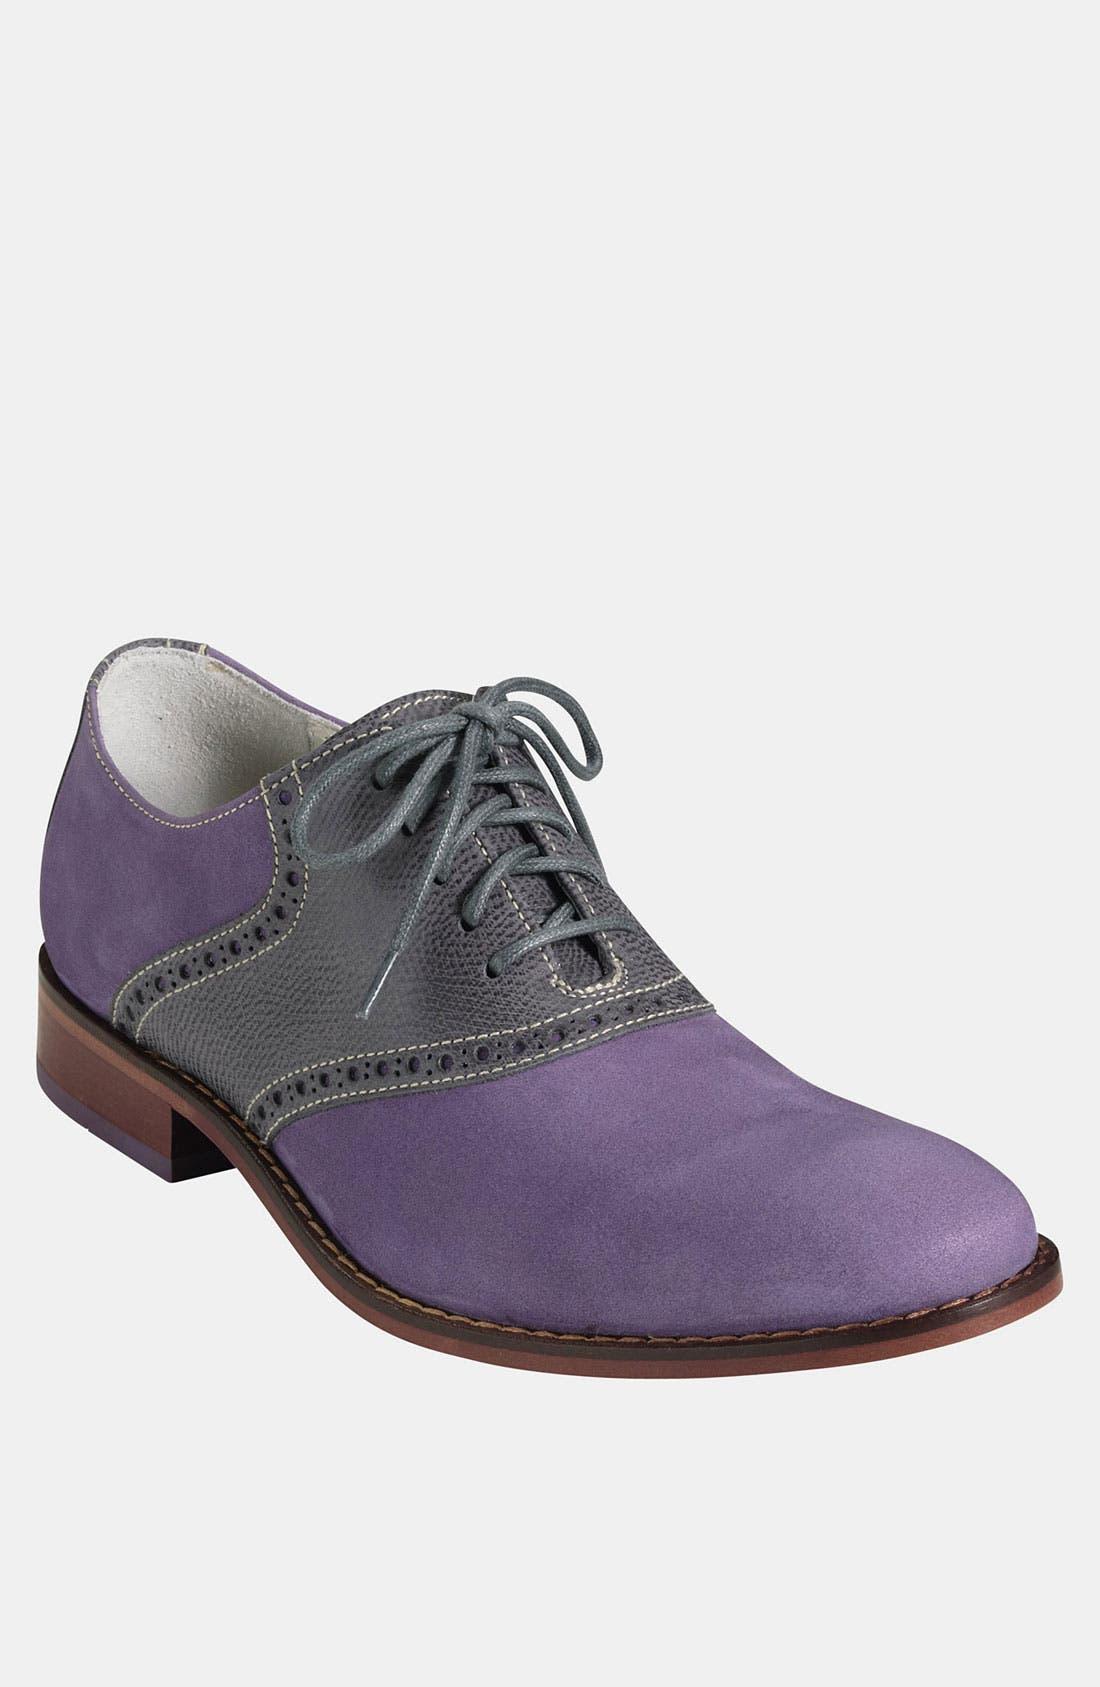 Main Image - Cole Haan 'Air Colton' Saddle Shoe